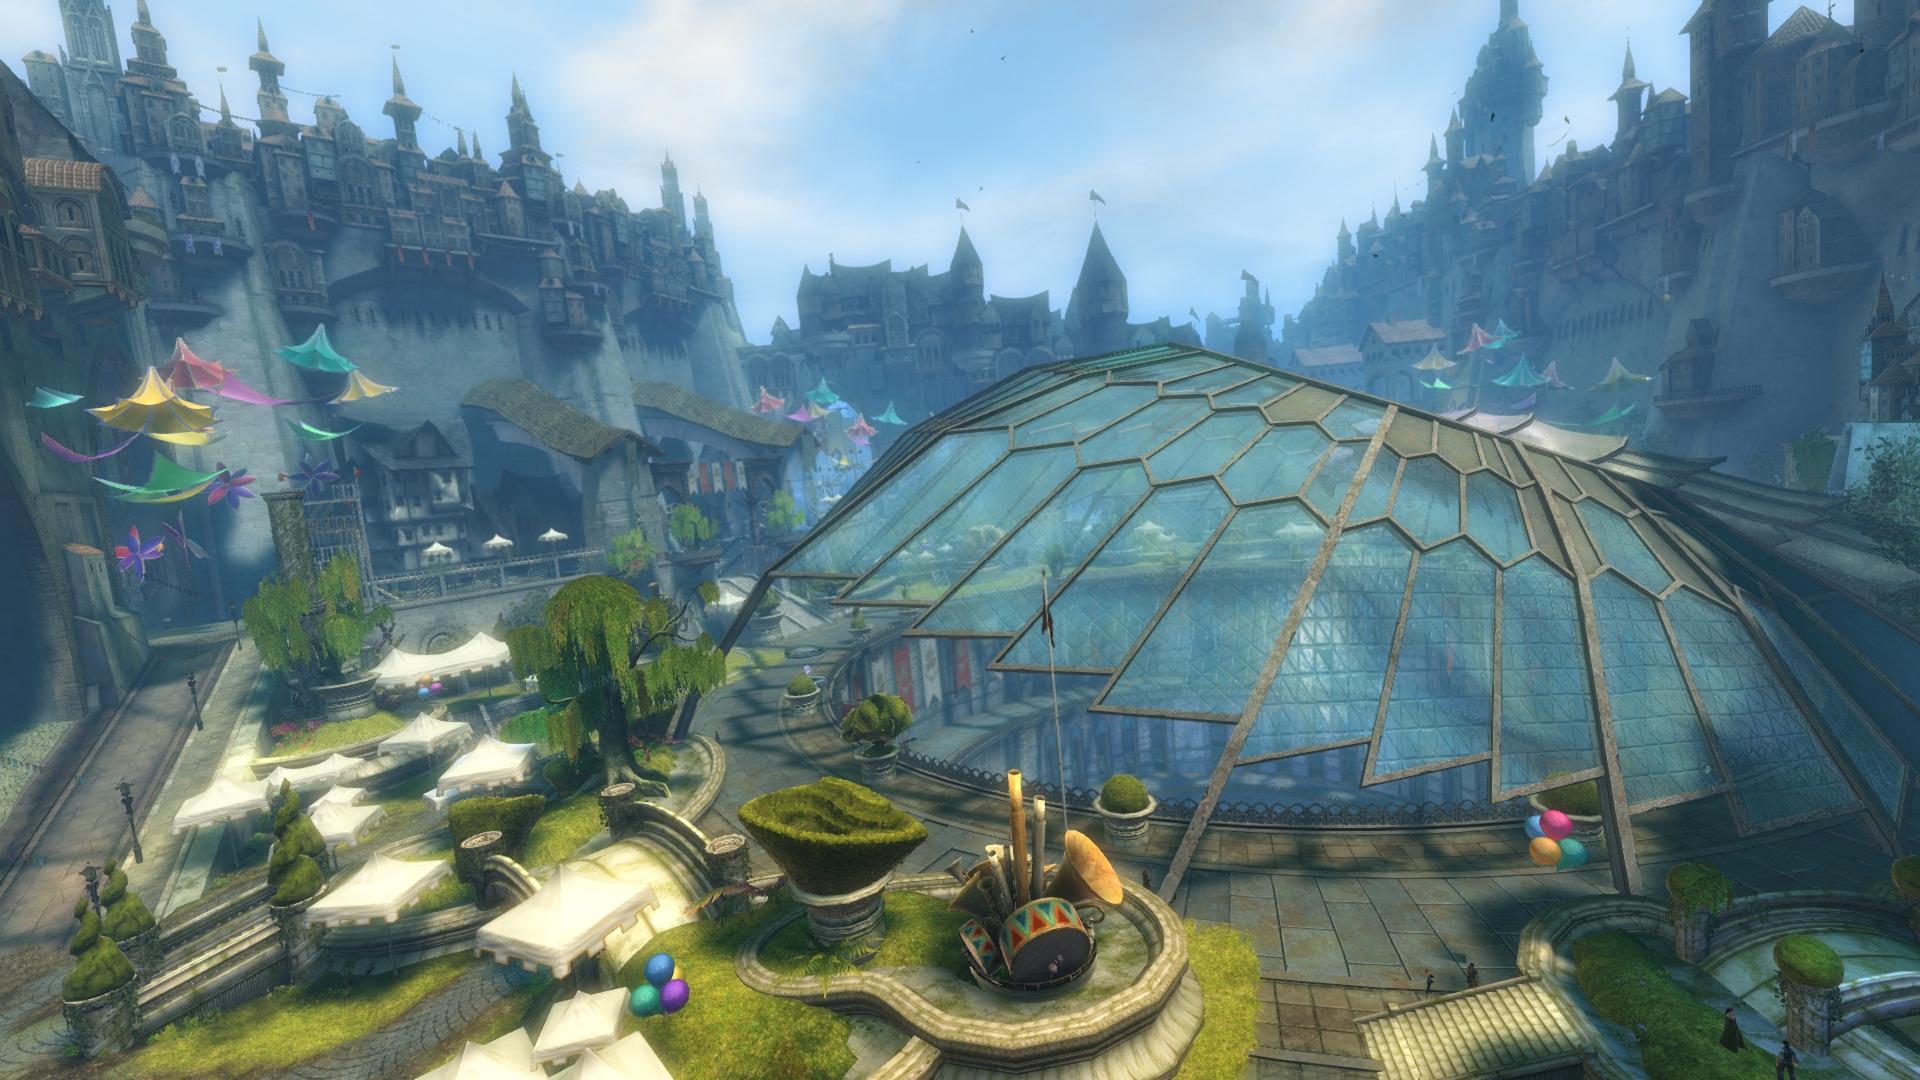 Guild wars 2 forum - charr - dinky appreciation thread forum-enguildwars2com